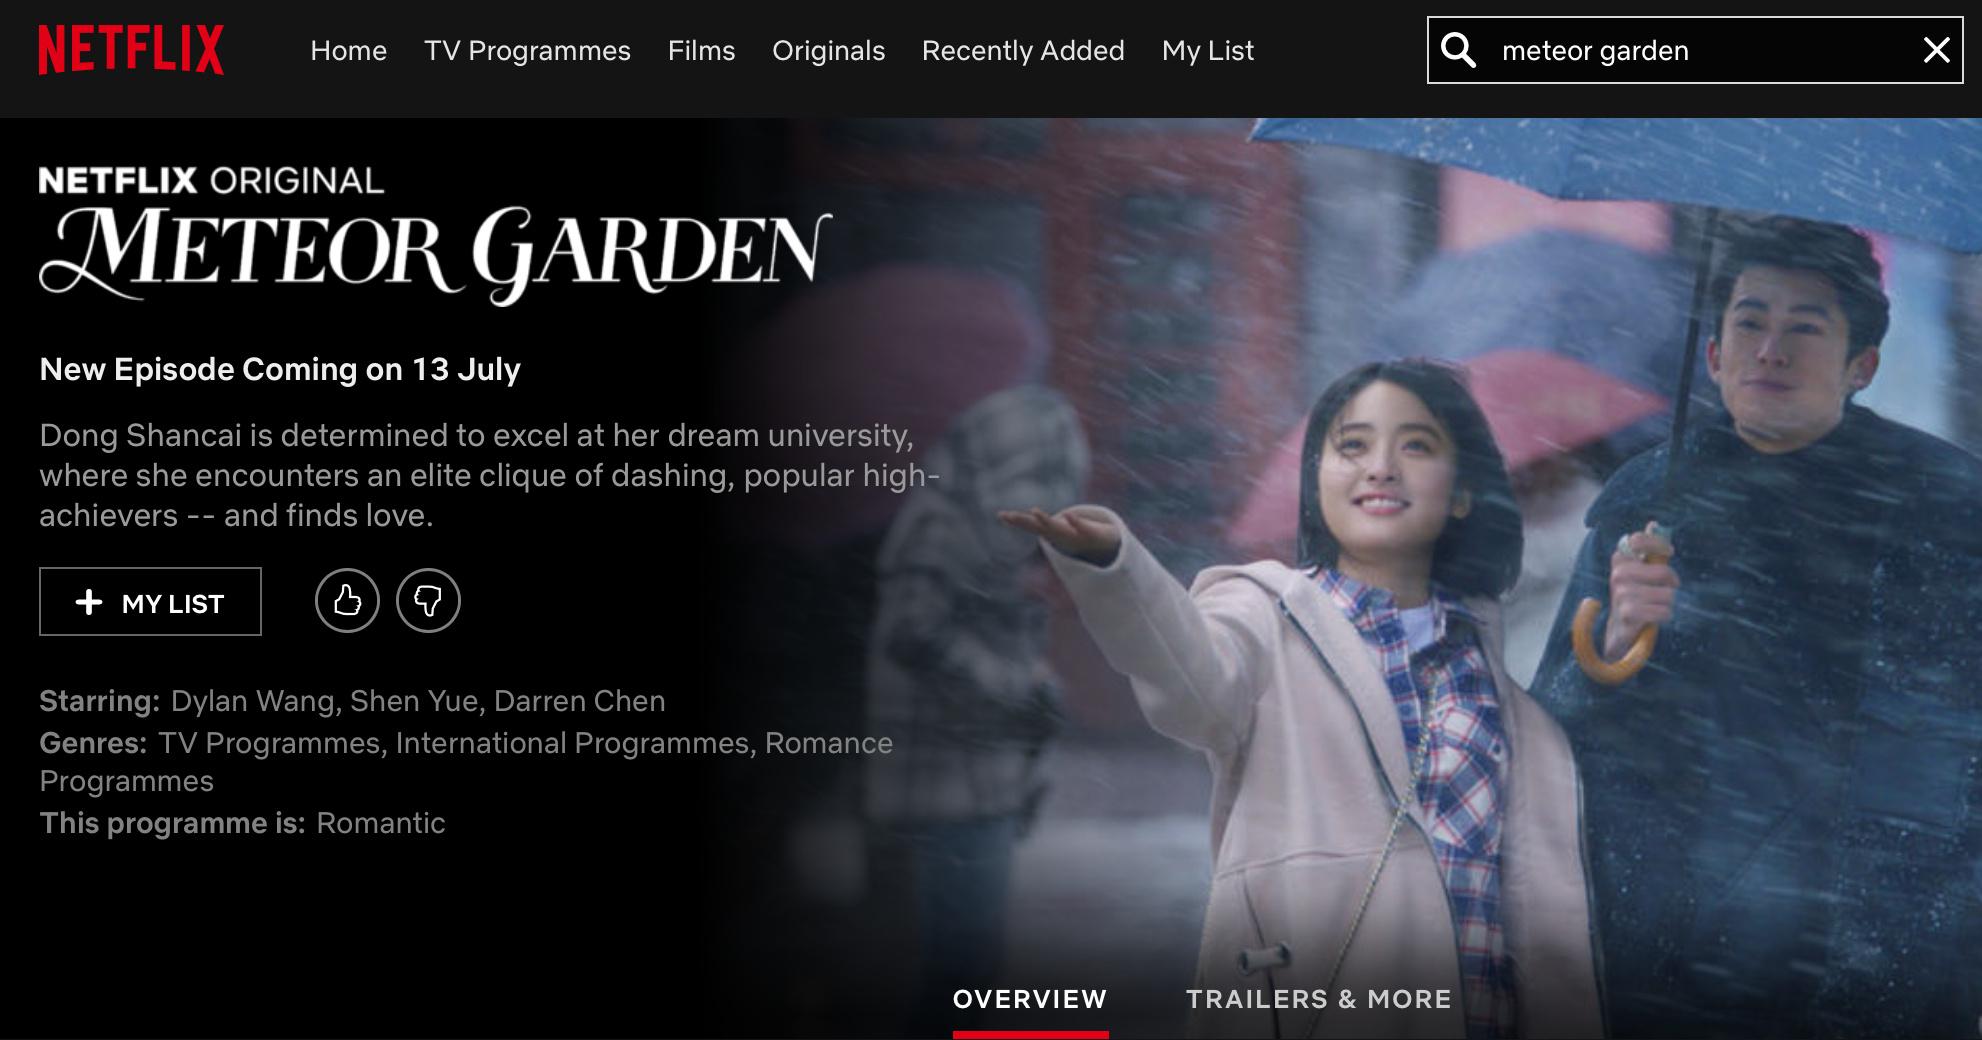 Netflix买剧不看质量吗?新版《流星花园》海外版权被他们买下了插图12